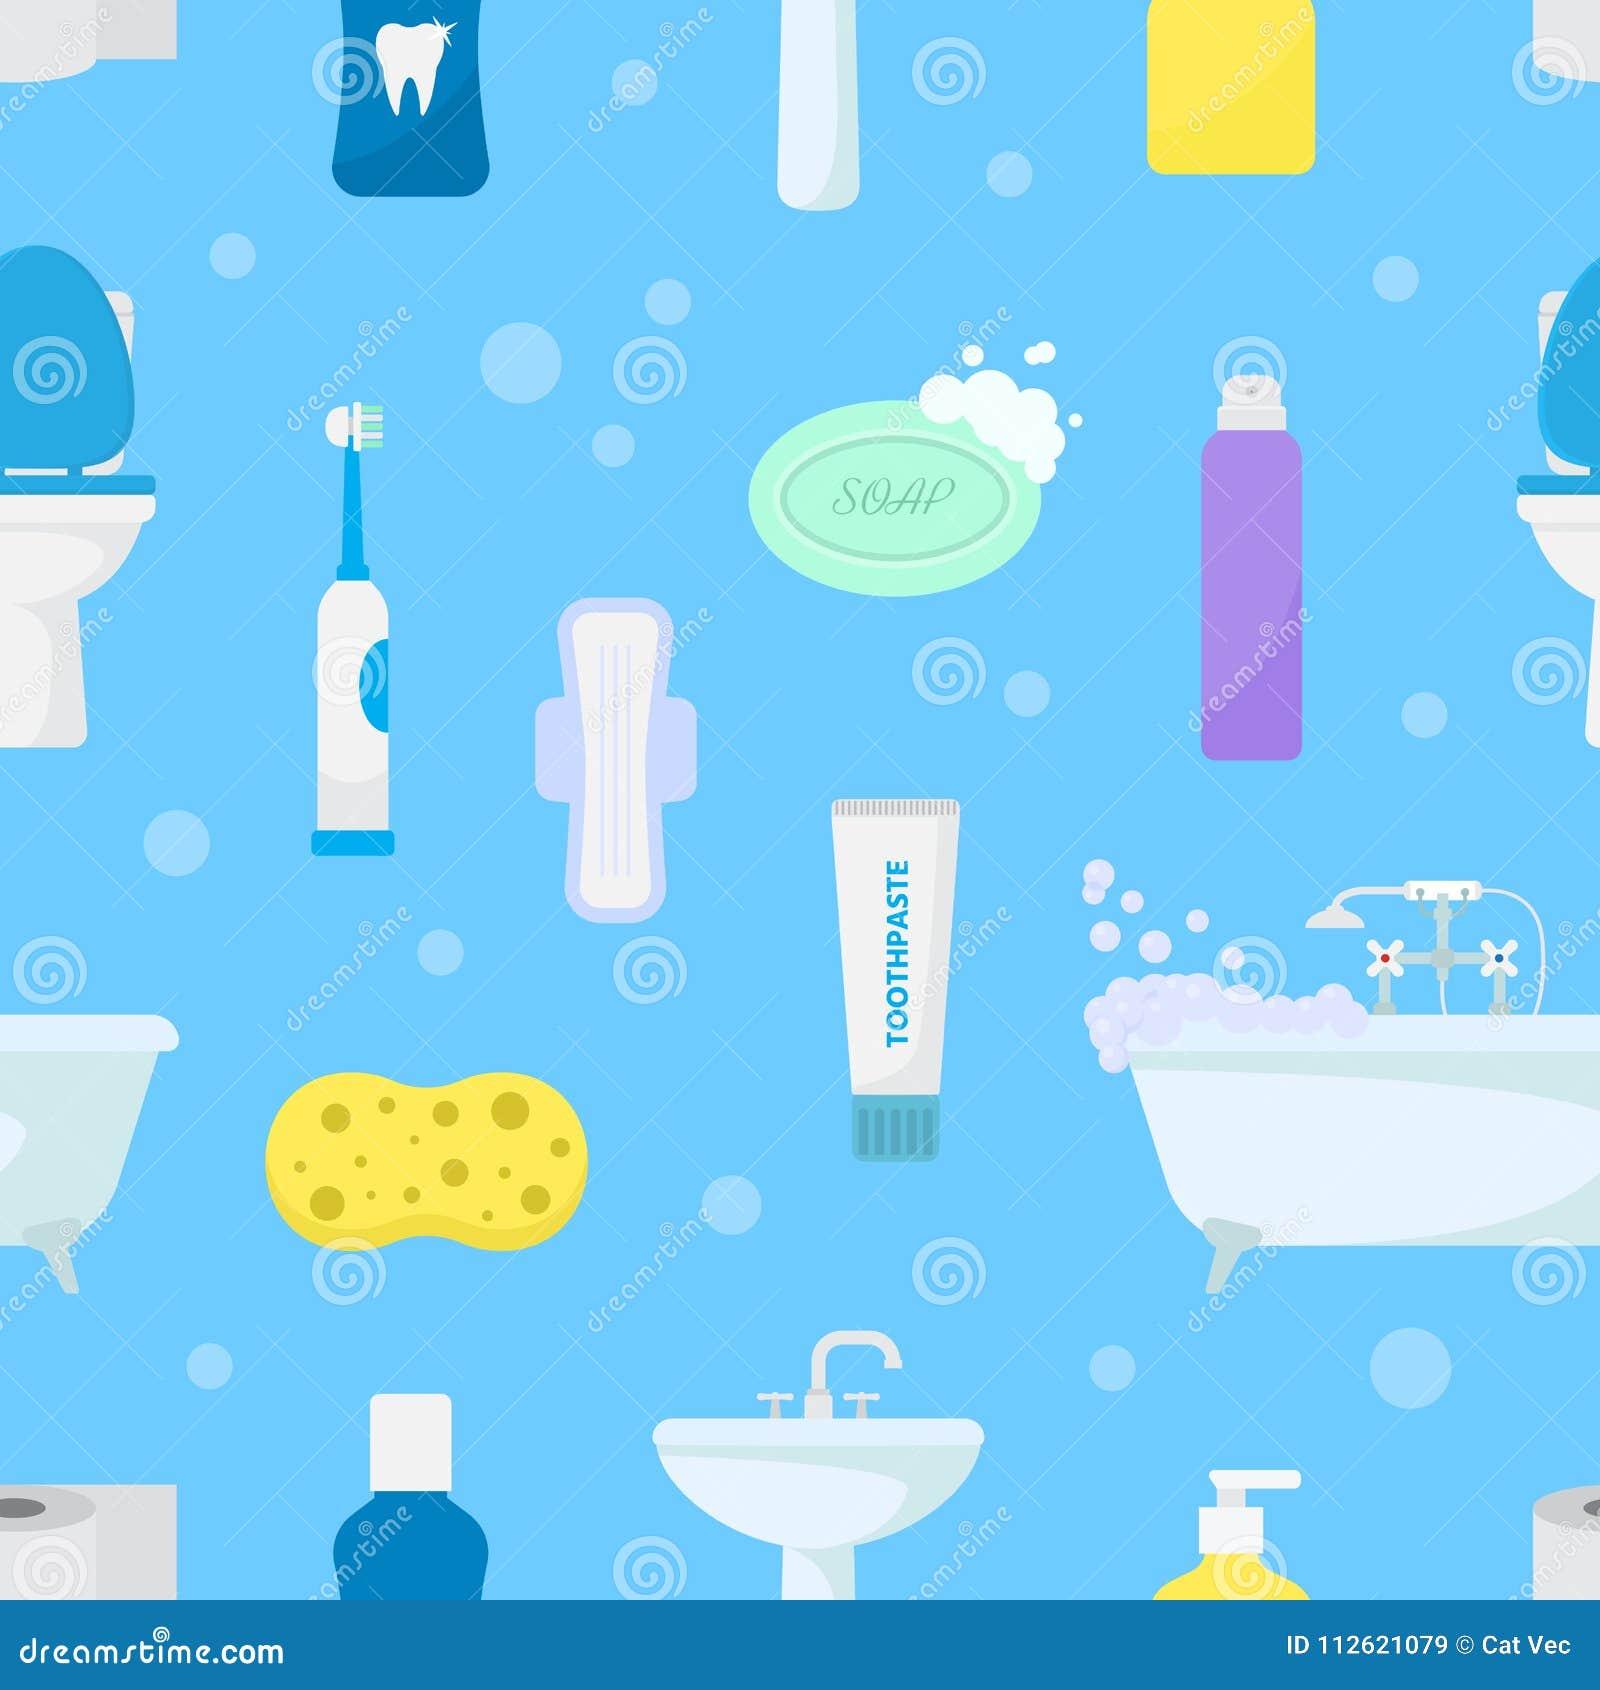 Hygiene Personal Care Vector Toiletries Set Of Hygienic Bath ...